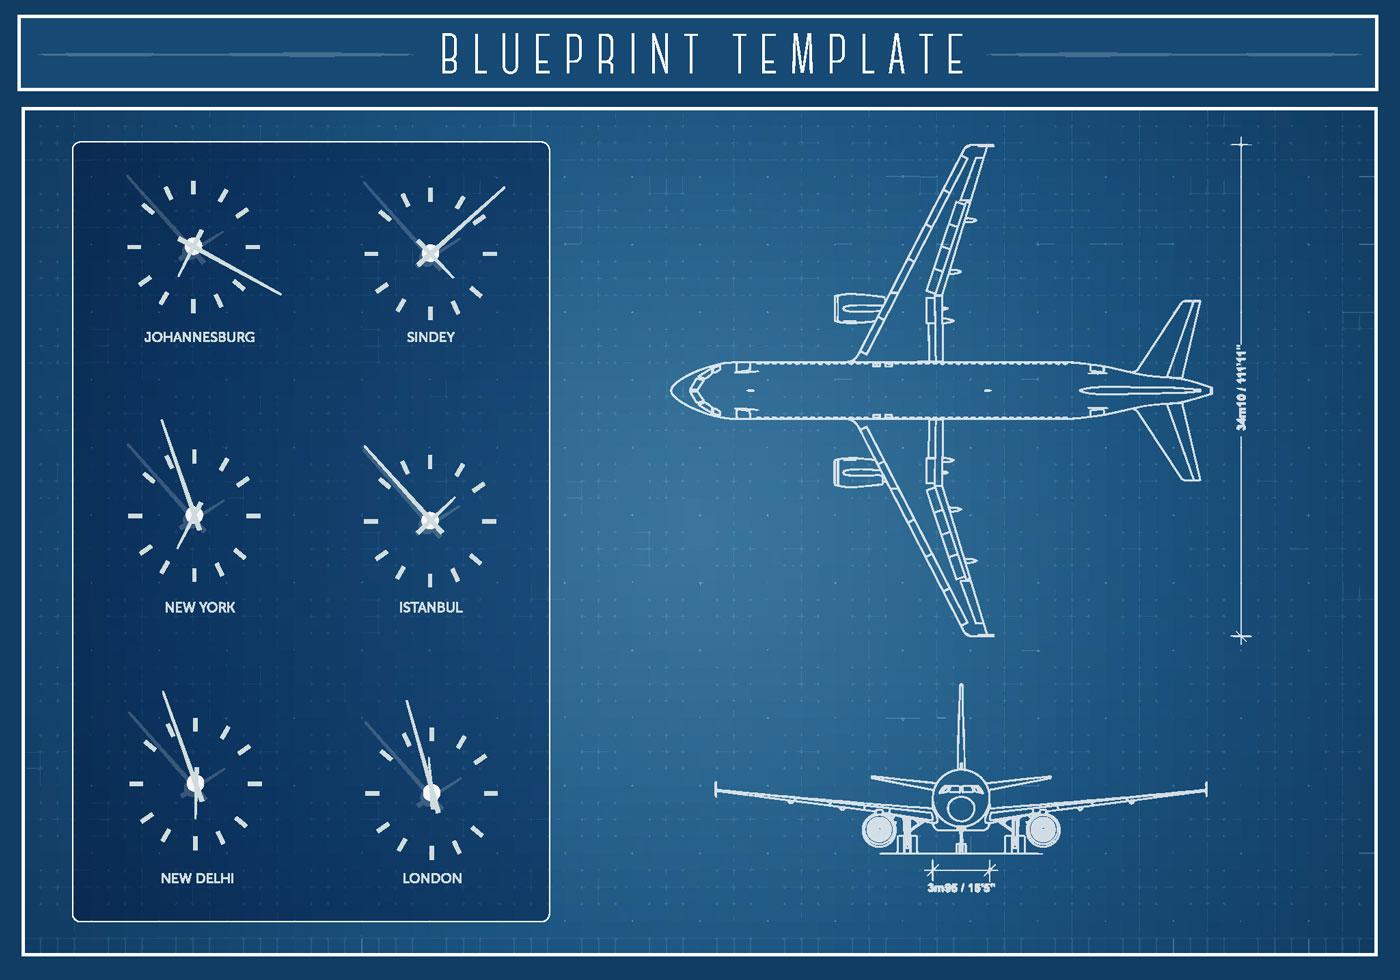 Airlplane blueprint vector download free vector art stock airlplane blueprint vector download free vector art stock graphics images malvernweather Images